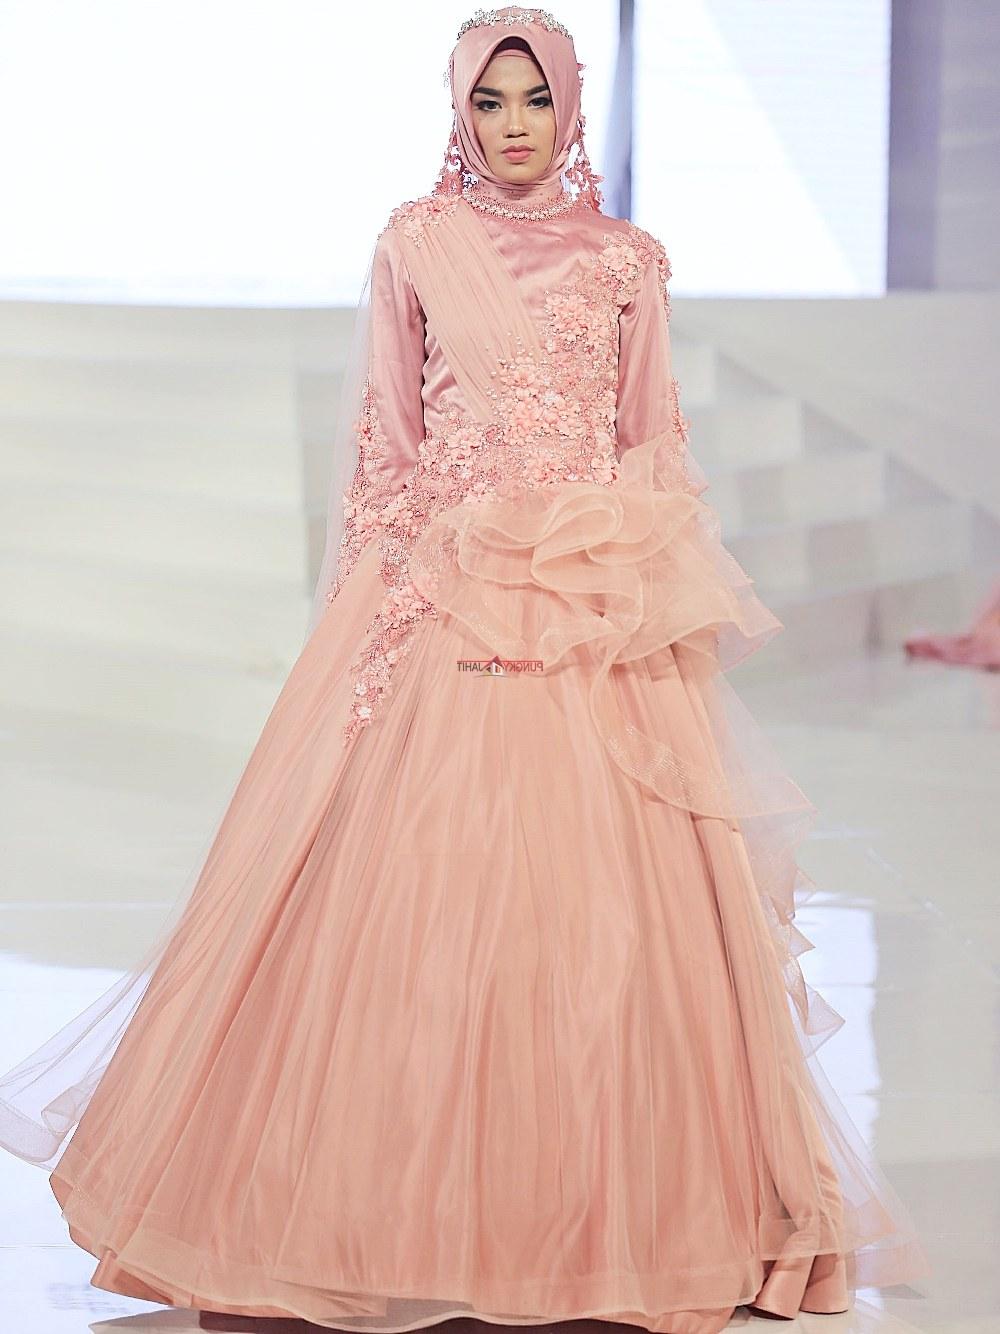 Design Sewa Baju Pengantin Muslimah Murah D0dg Sewa Perdana Baju Pengantin Muslimah Jogja Gaun Pengantin